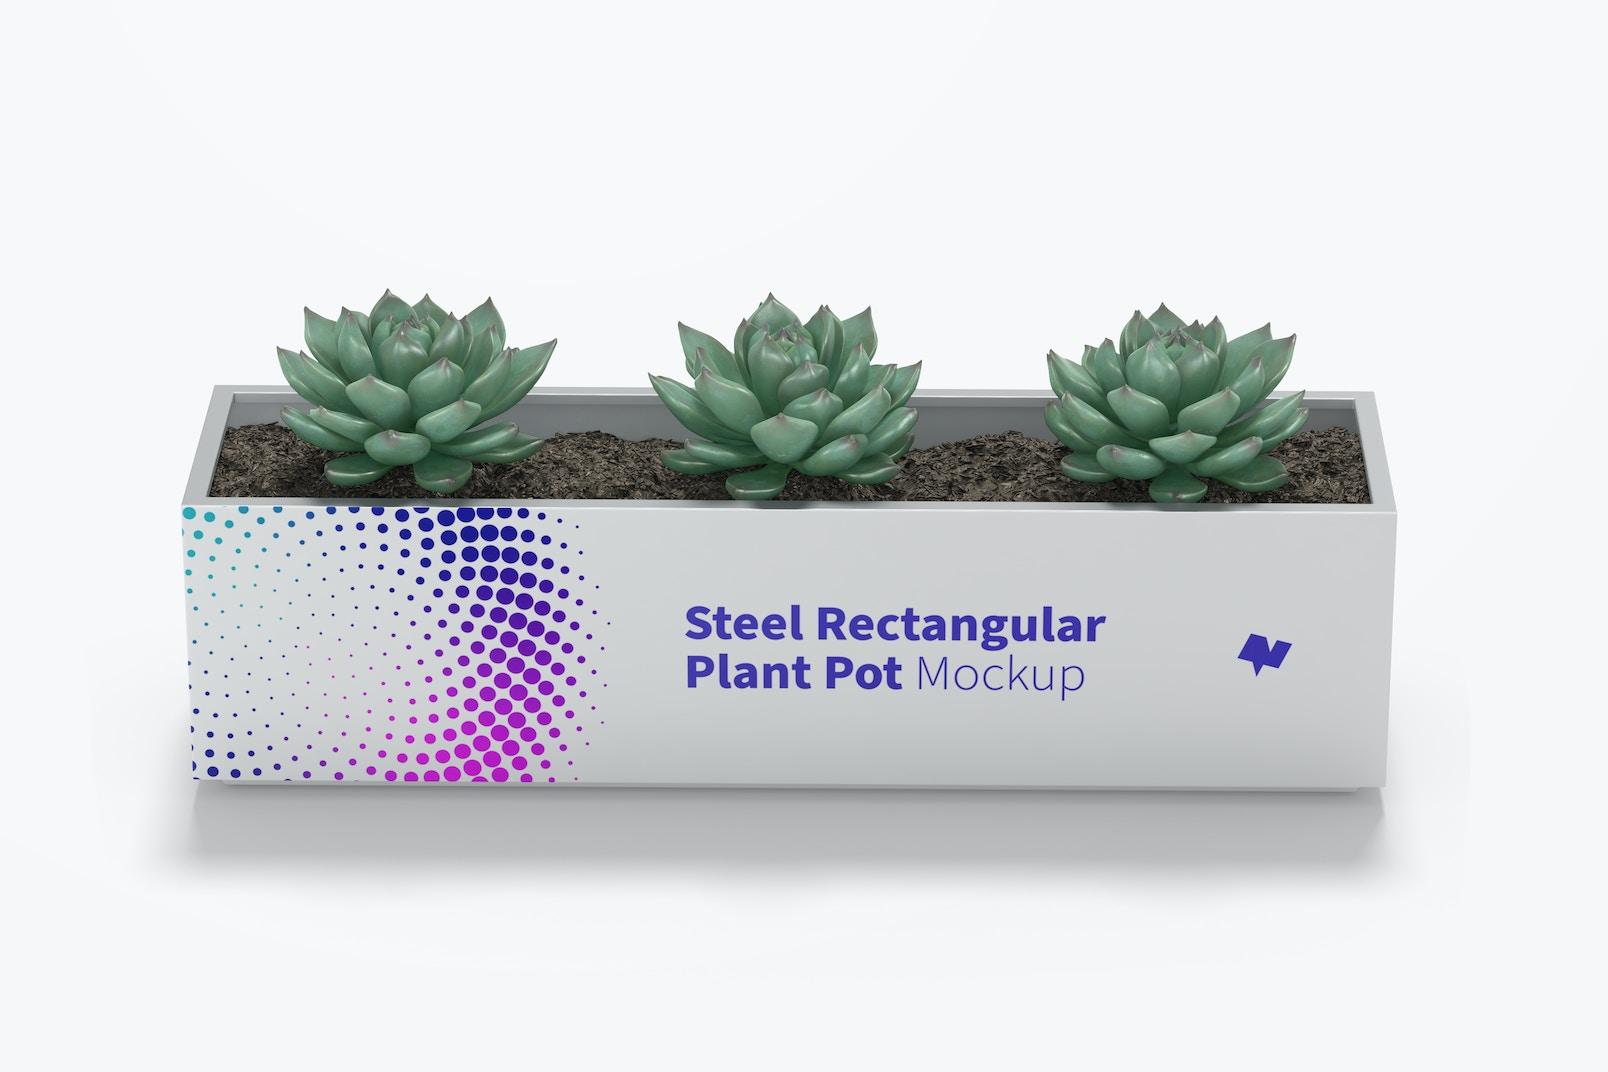 Steel Rectangular Plant Pot Mockup, Front View